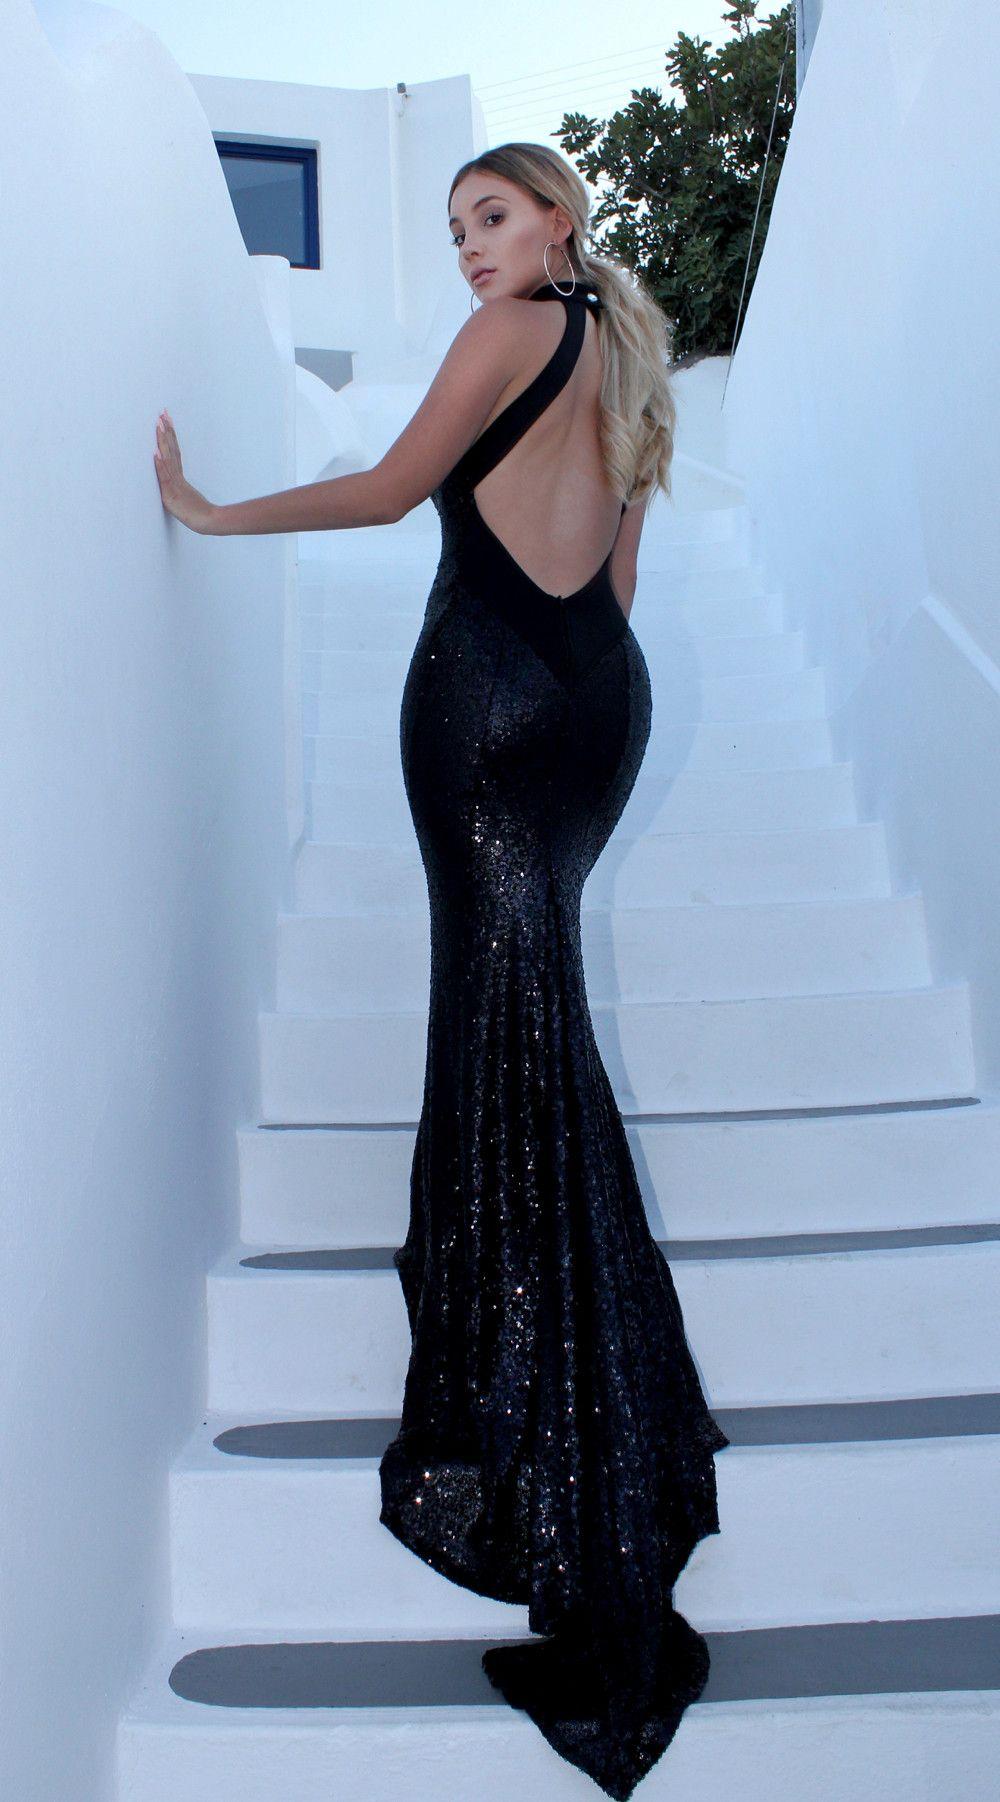 Chloe Black | Sequins, Formal and Glam dresses